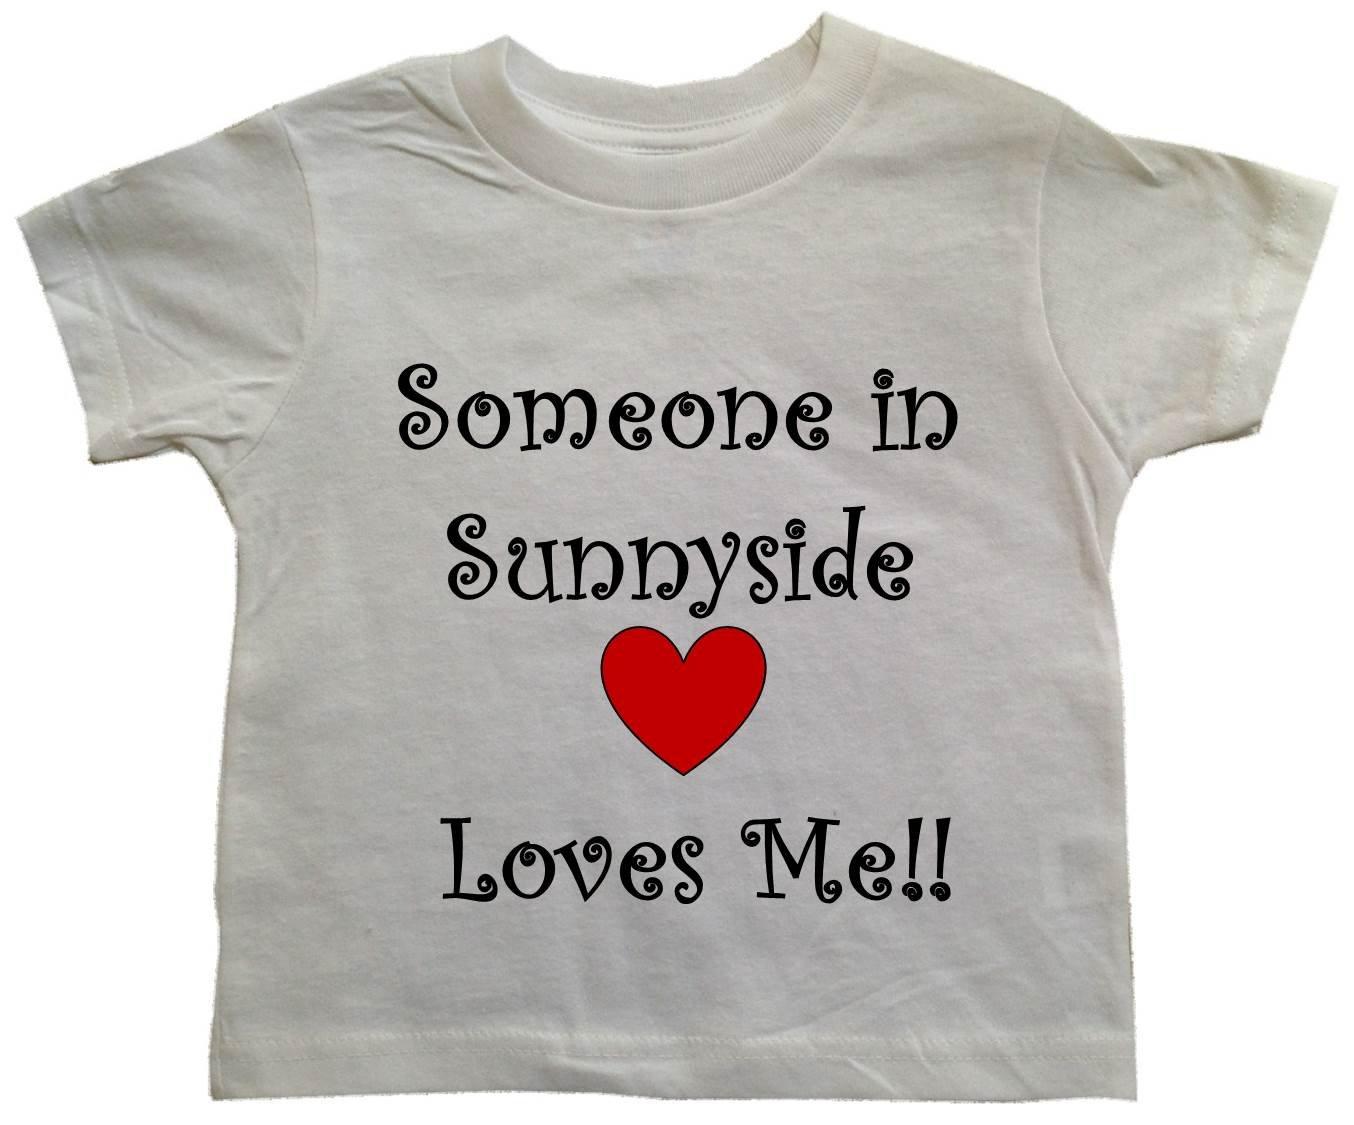 Buy Sunnyside Federal Now!